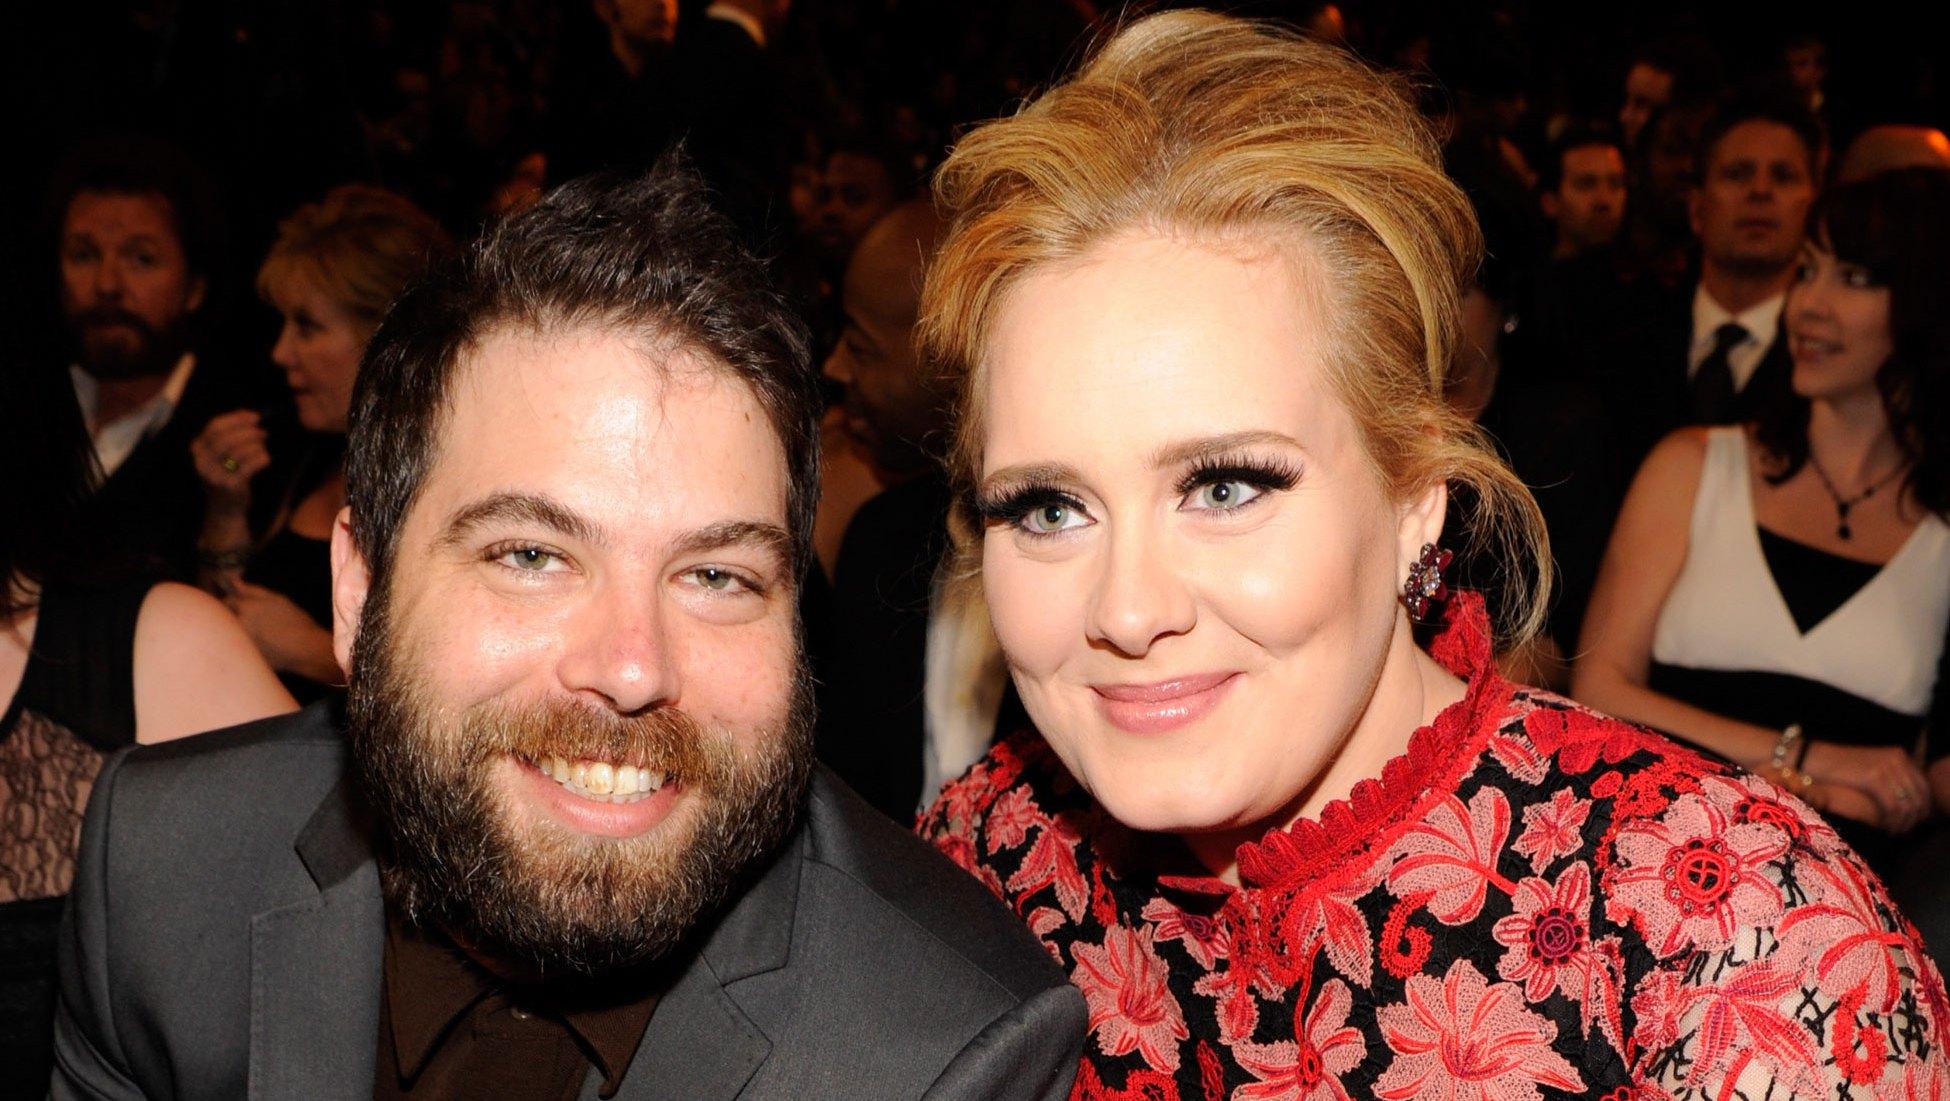 Adele Gave Her Los Angeles Home to Estranged Husband Simon Konecki 2 Months Before Announcing Split